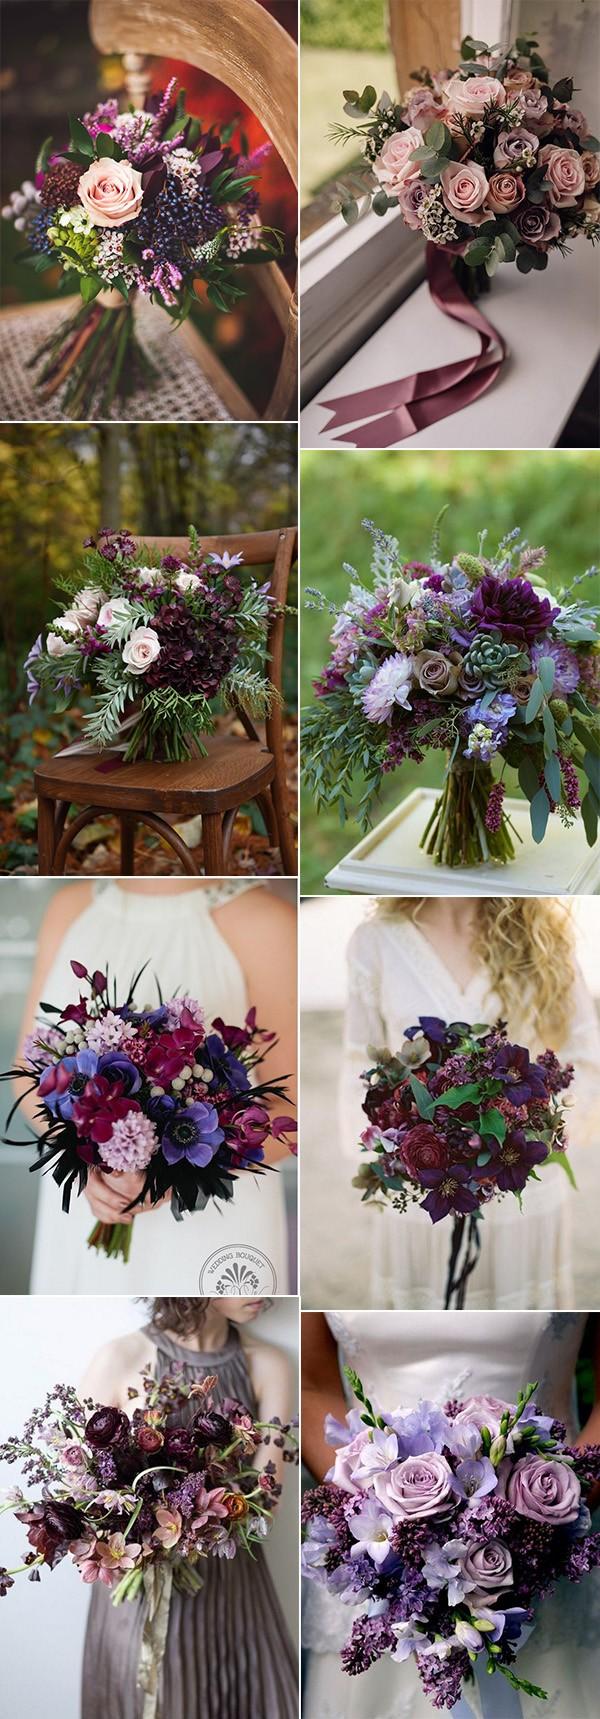 Pantone Color 2018 34 Amazing Ultra Violet Wedding Color Ideas For 2019 Page 2 Of 5 Emmalovesweddings